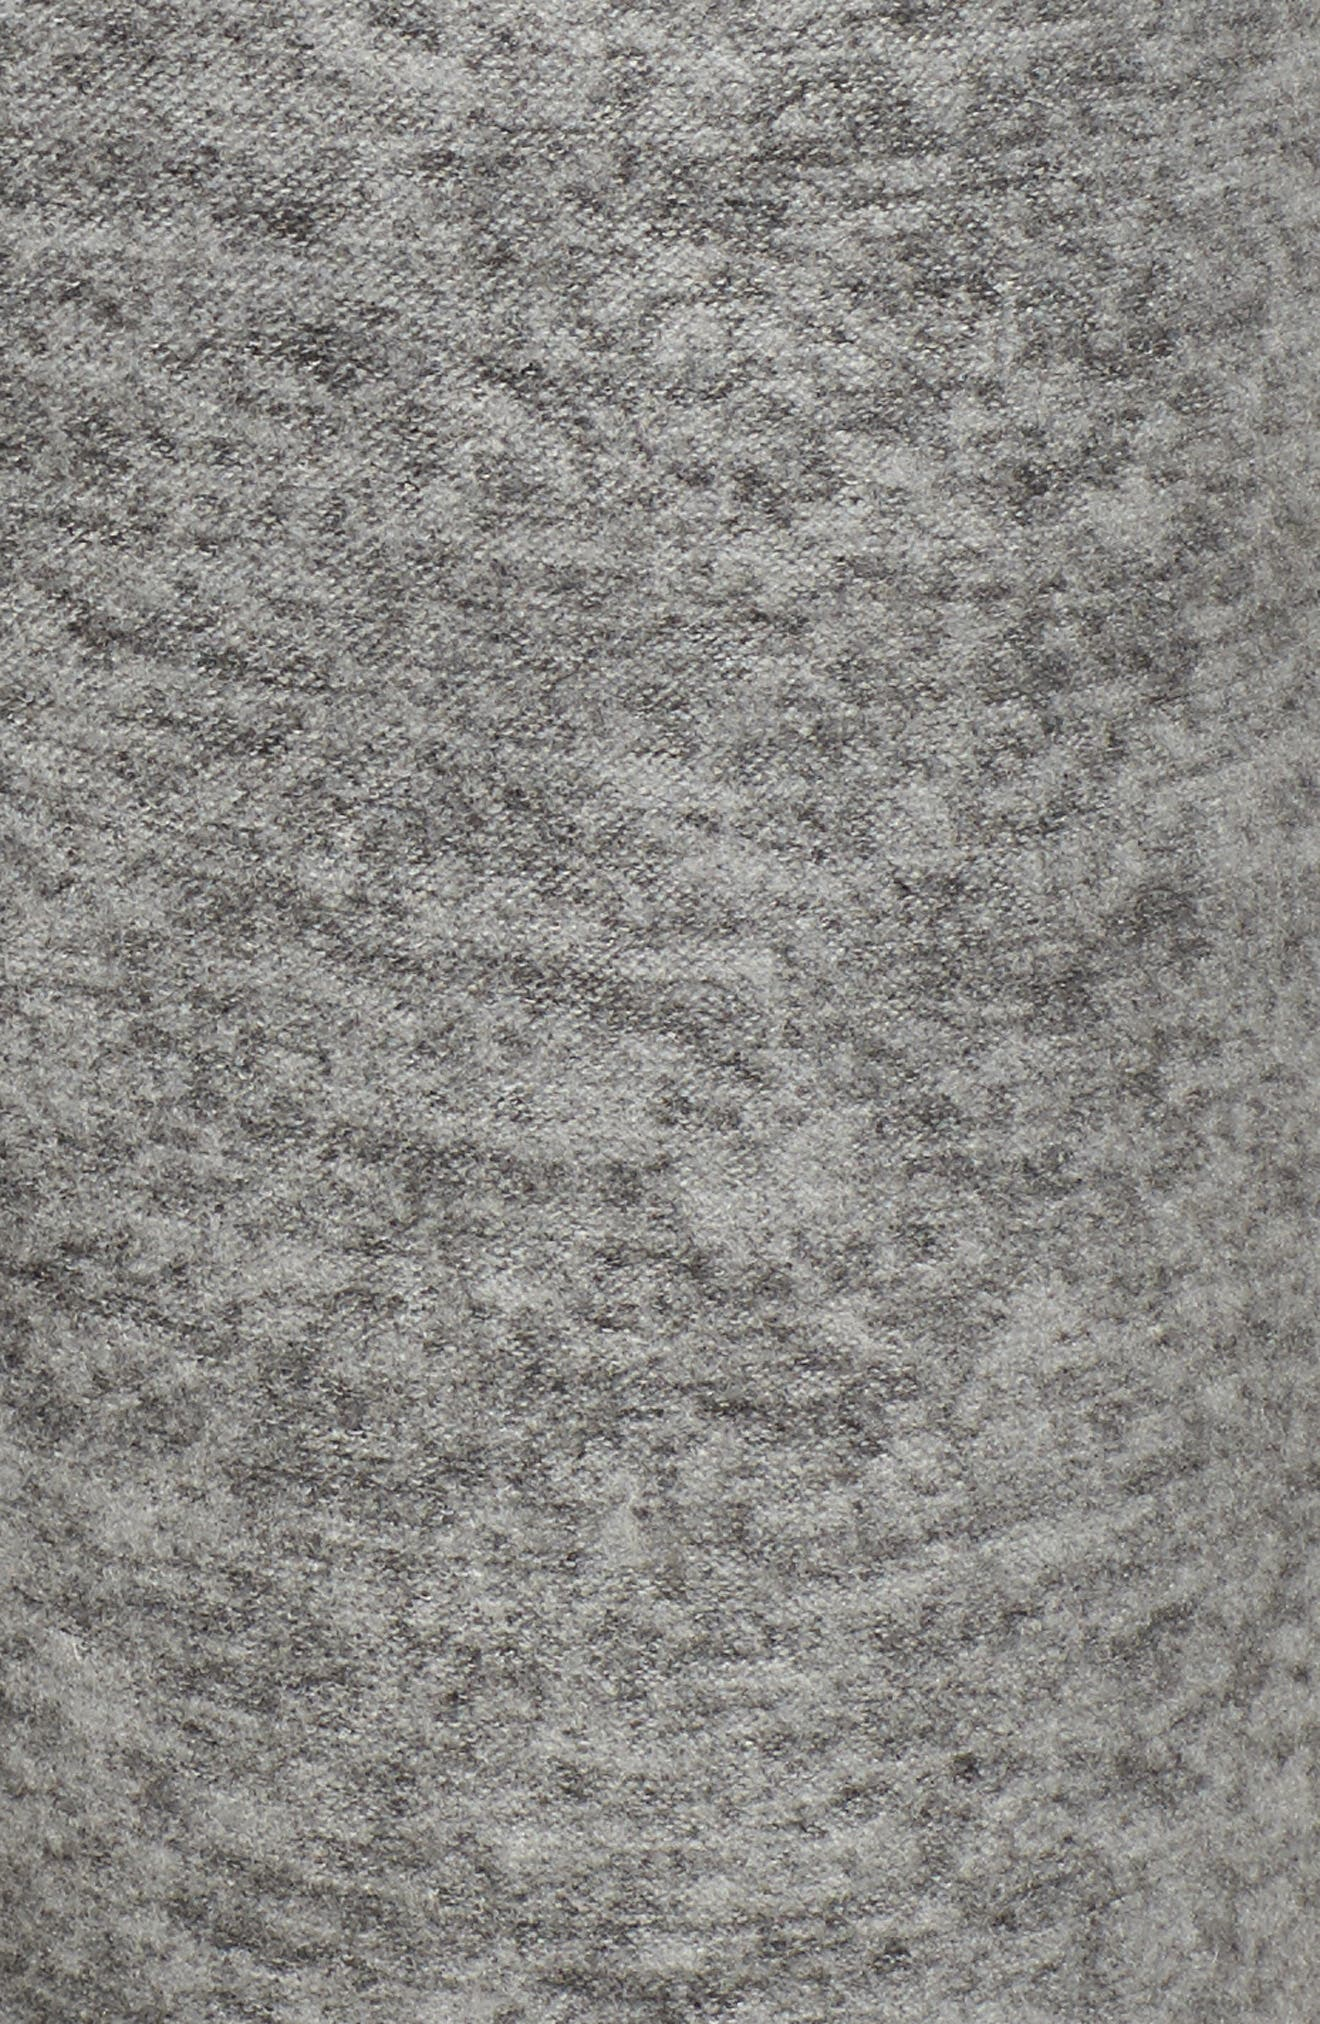 Mountain Air Pants,                             Alternate thumbnail 5, color,                             073